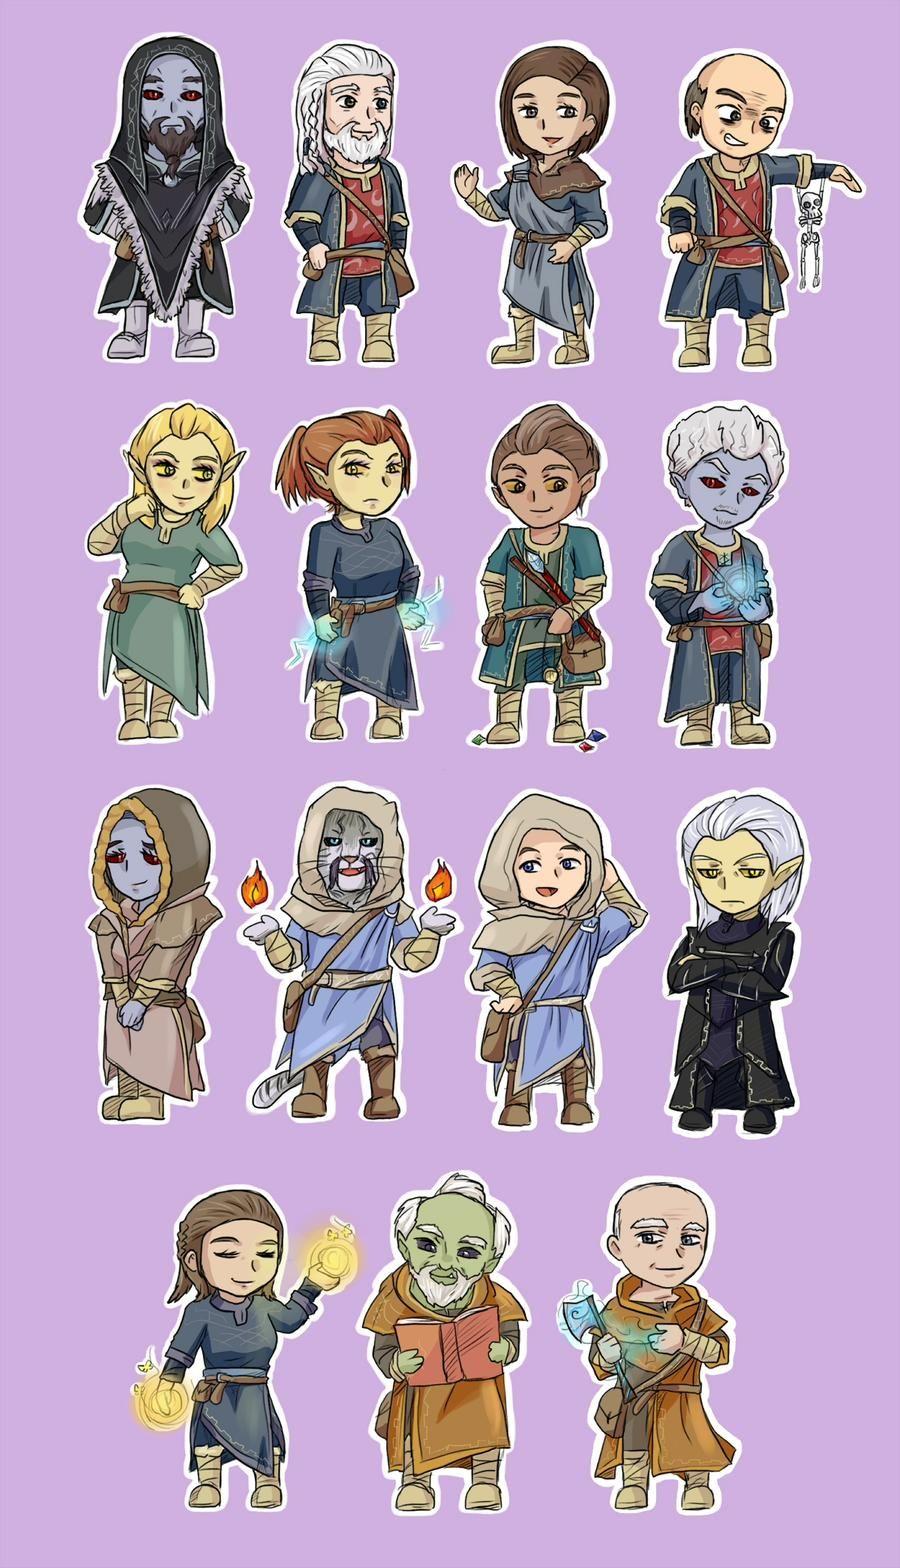 Tes 5 College Of Winterhold By Keterok On Deviantart In 2020 Elder Scrolls Games Elder Scrolls Skyrim Skyrim Art